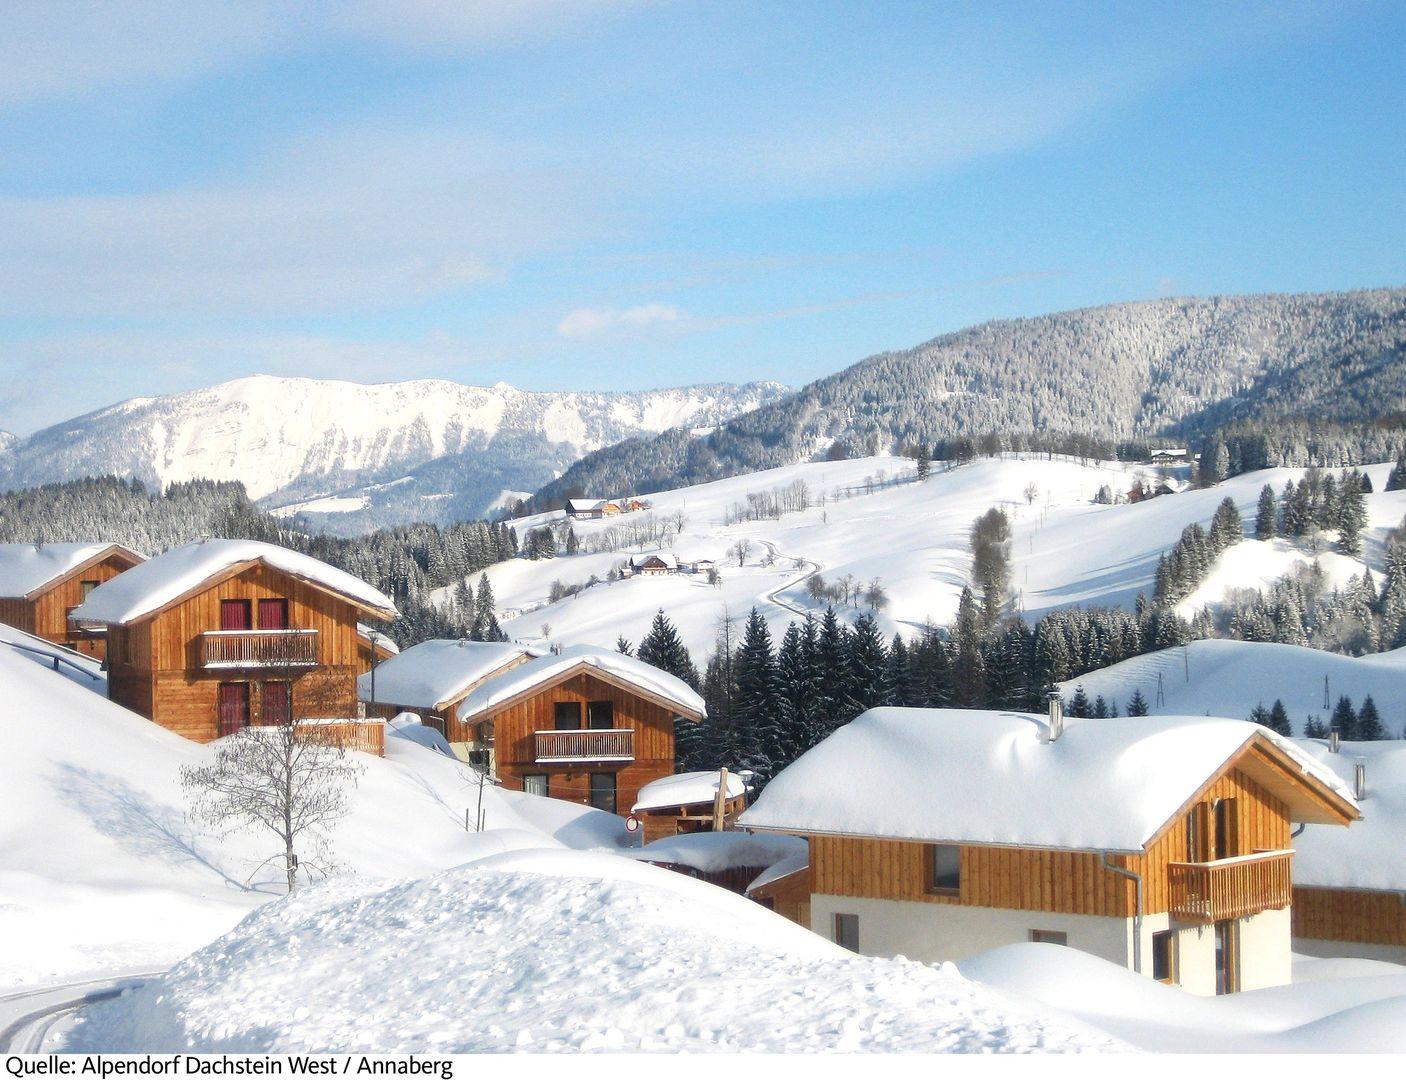 Appartement de vacances 8-Pers.-Chalet (ca. 90 m², Enzian / Deluxe), OV, Alpendorf Dachstein-West (1983307), Annaberg, Tennengau, Salzbourg, Autriche, image 1